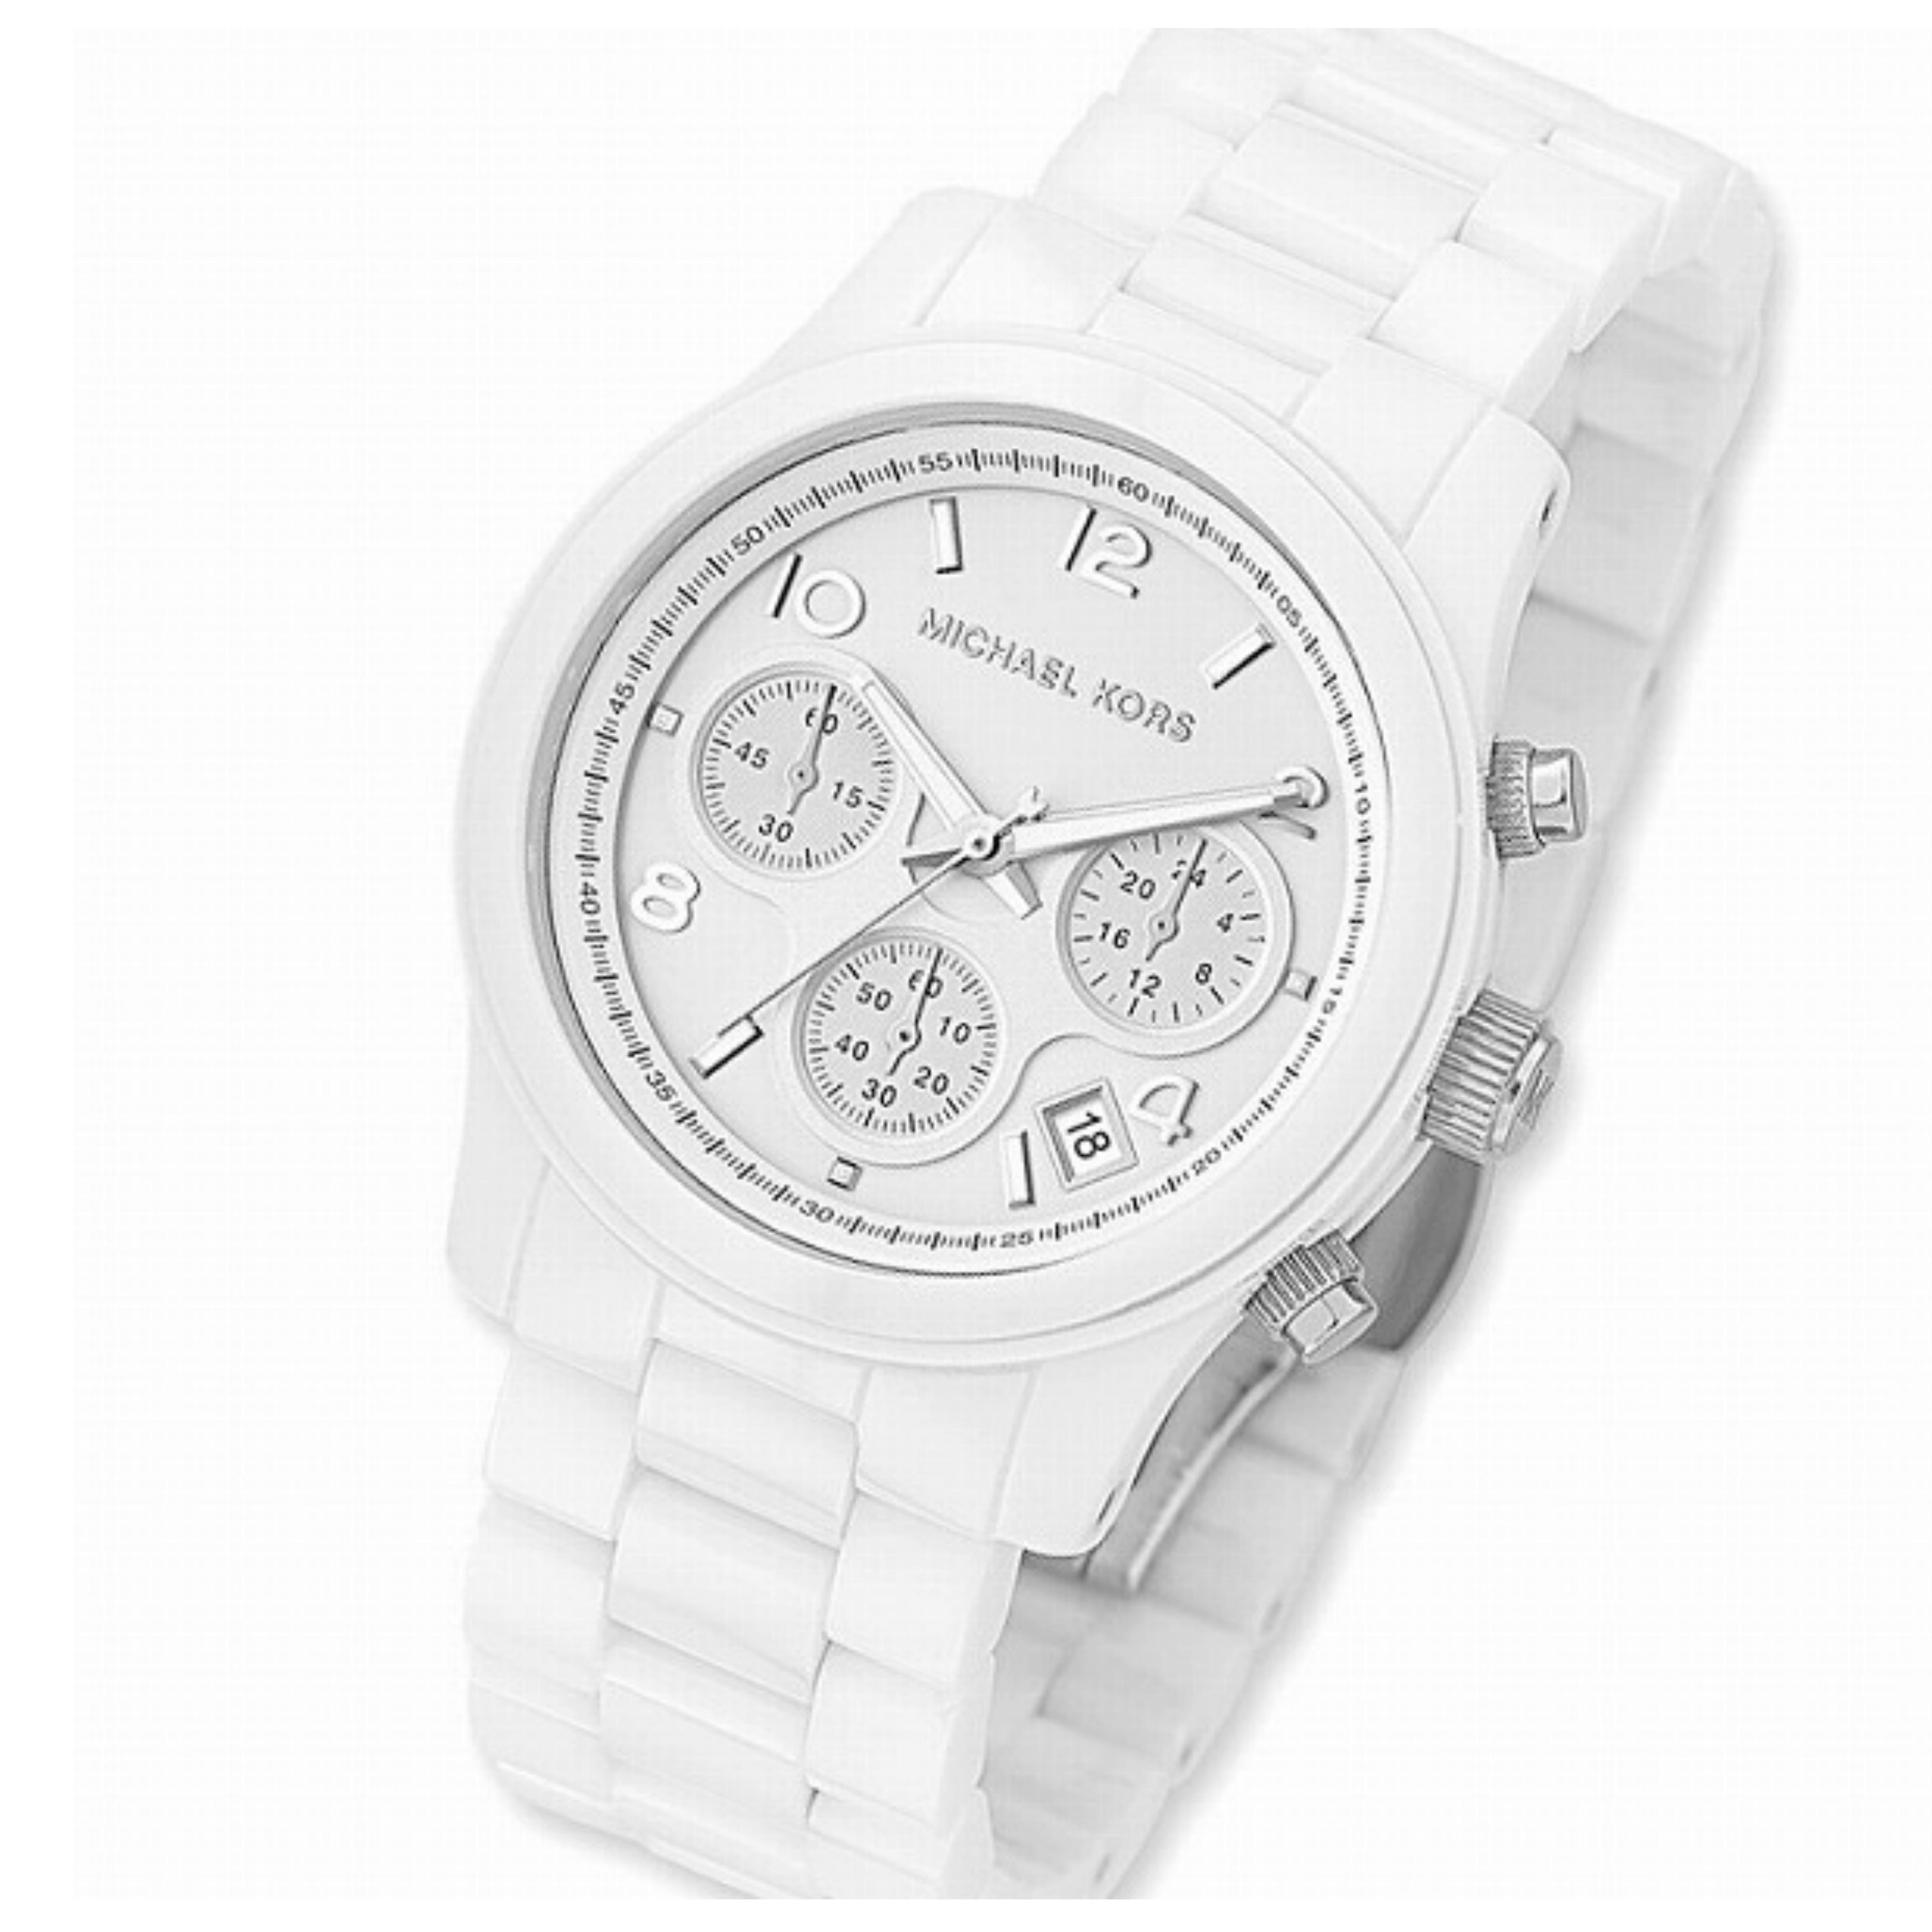 62ff4daf7ab9 Sentinel Michael Kors Runway Ladies  Watch MK5161│Chronograph Dial│White  Ceramic Bracelet